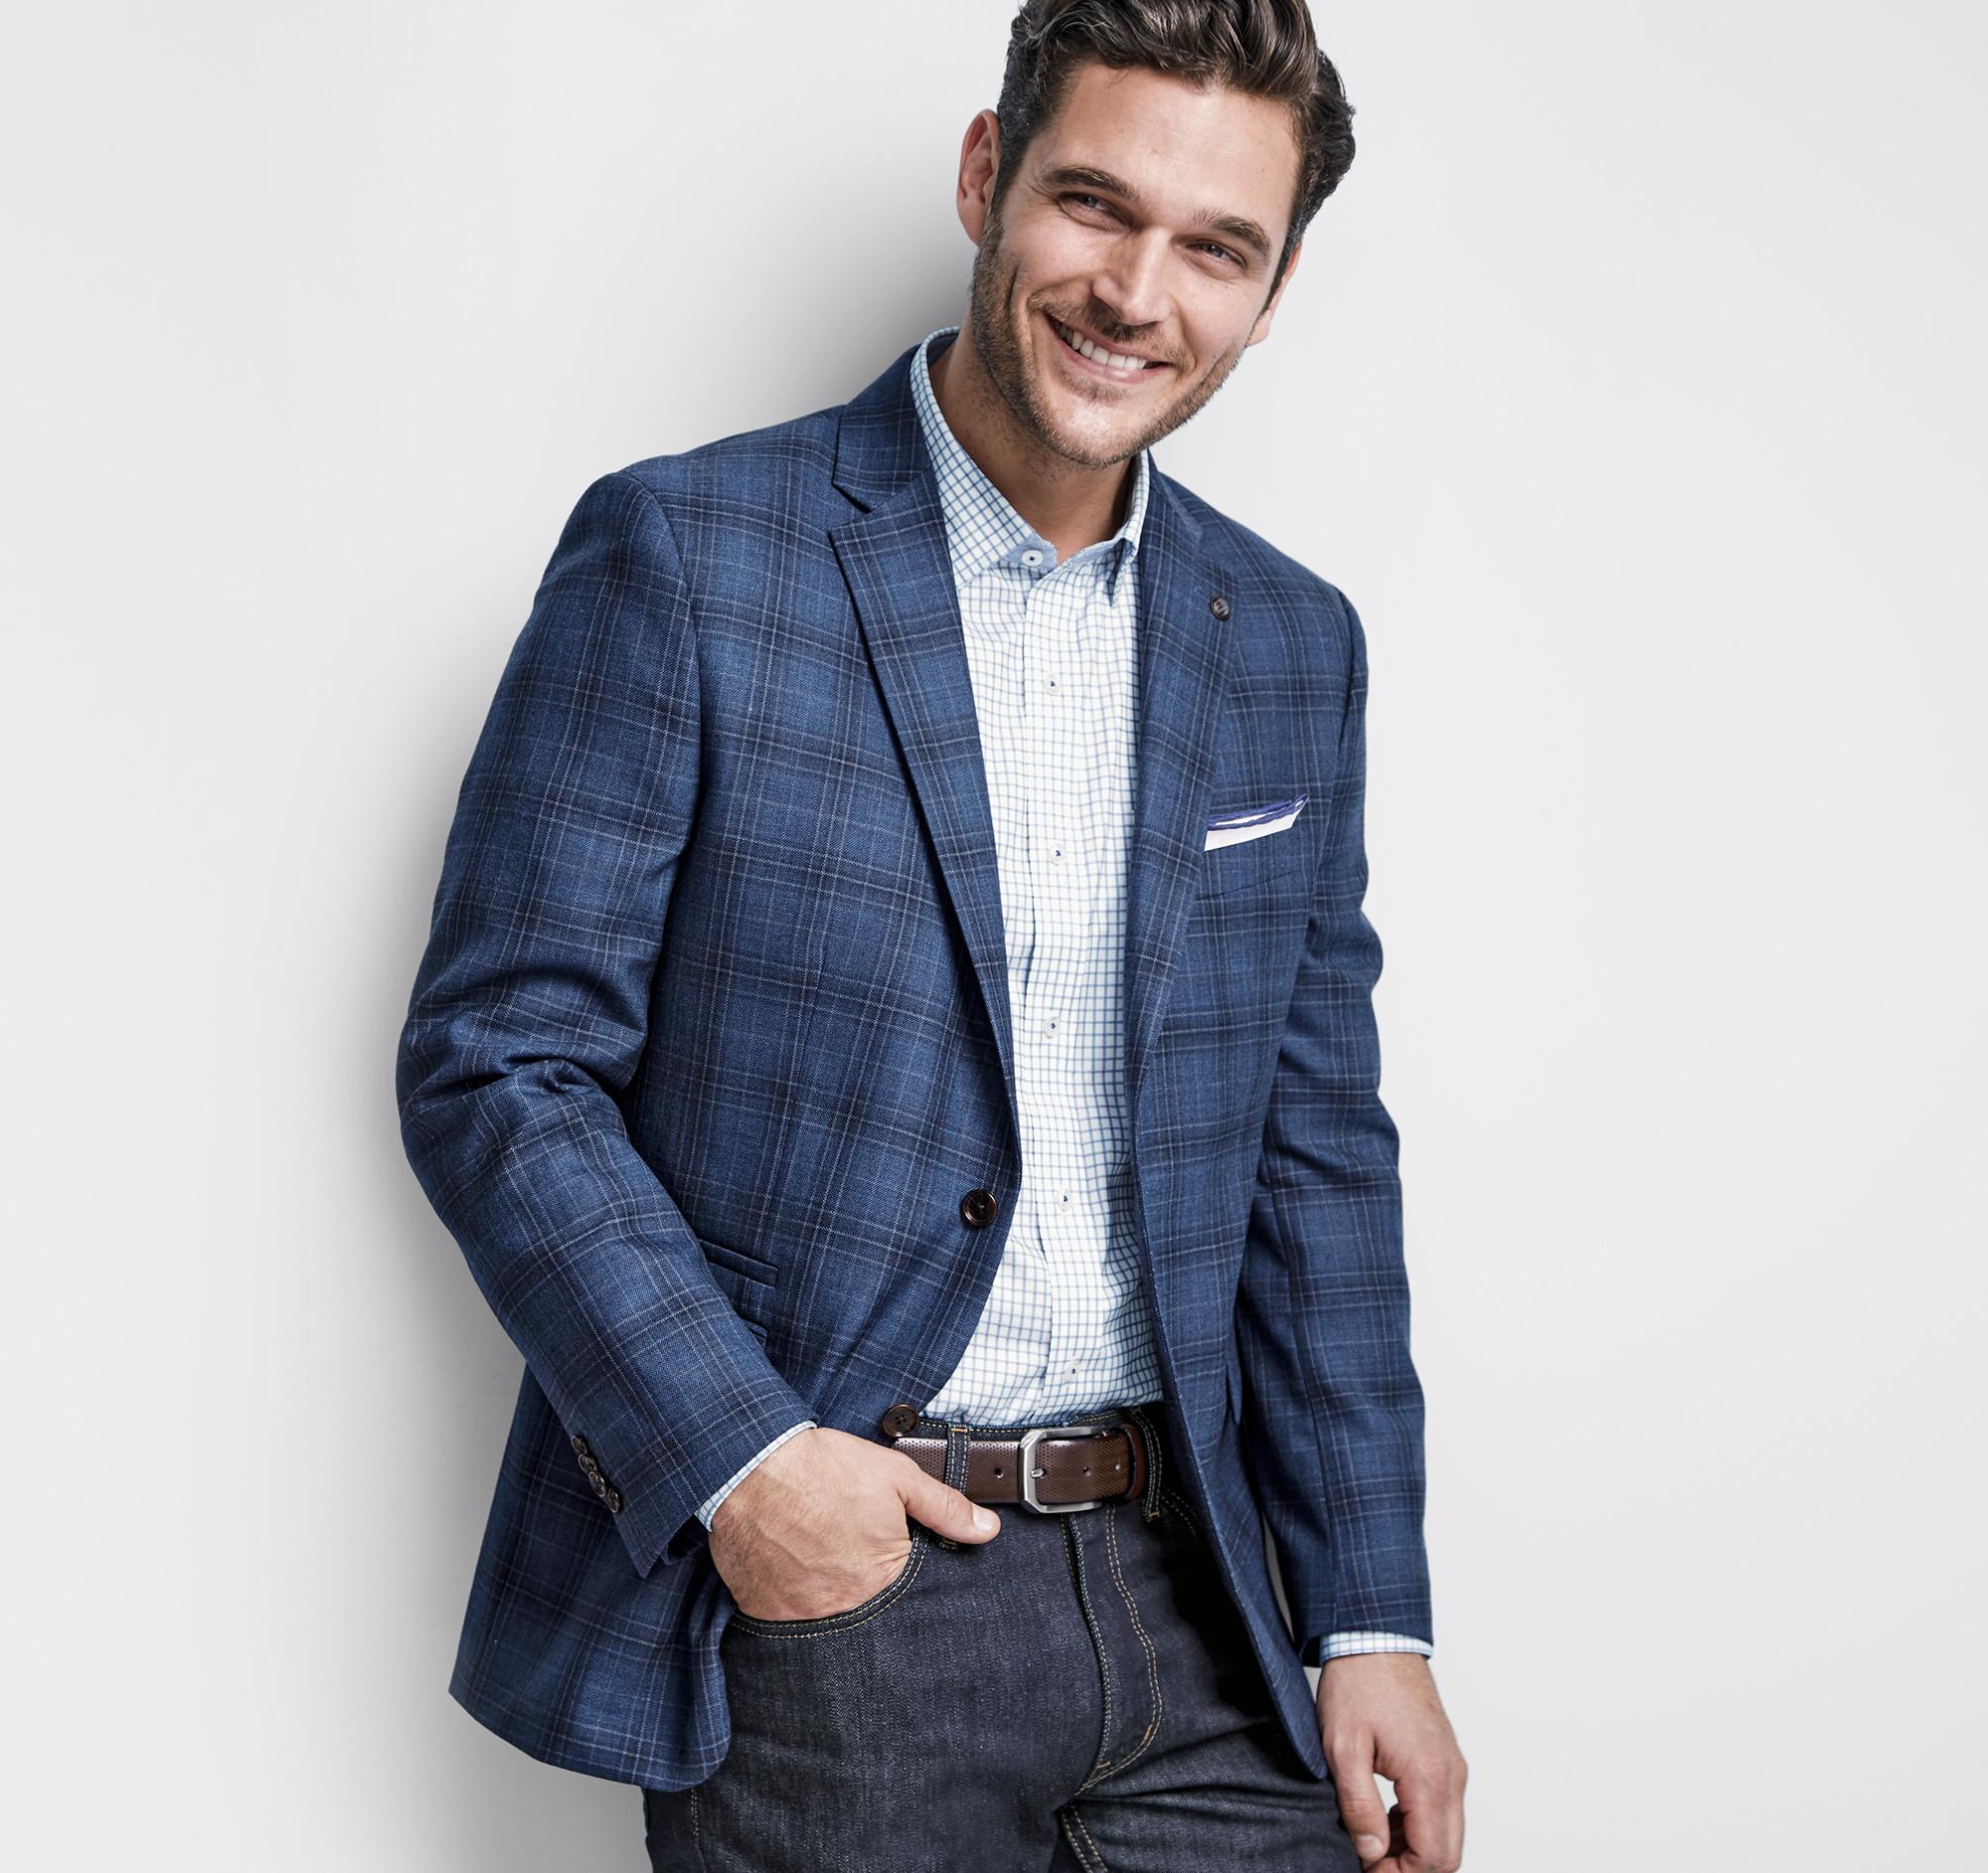 Chaps mens Quilted black navy Blazer Sport coat Jacket 38 42 44 46 48 NEW $ C $ C $ Shipping: + C $ Johnston & Murphy Mens 14 Shuler Bicycle Toe Black Leather Oxfords Shoe C $ C $ + Shipping. Men's CONNOISSEUR Brown Blue Plaid Suit Coat Wool Size 42R Blazer.